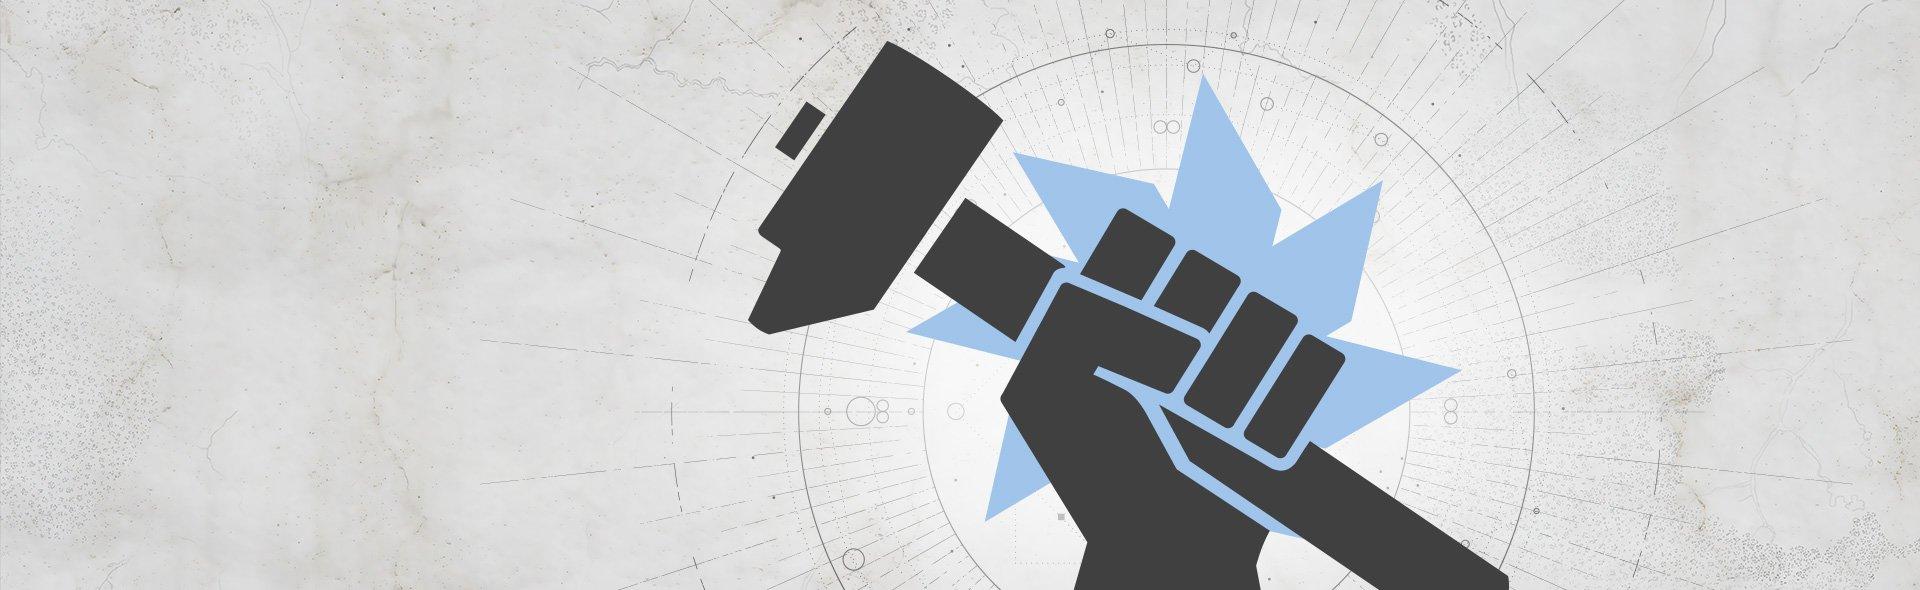 《天命2》更新檔3.3.1版